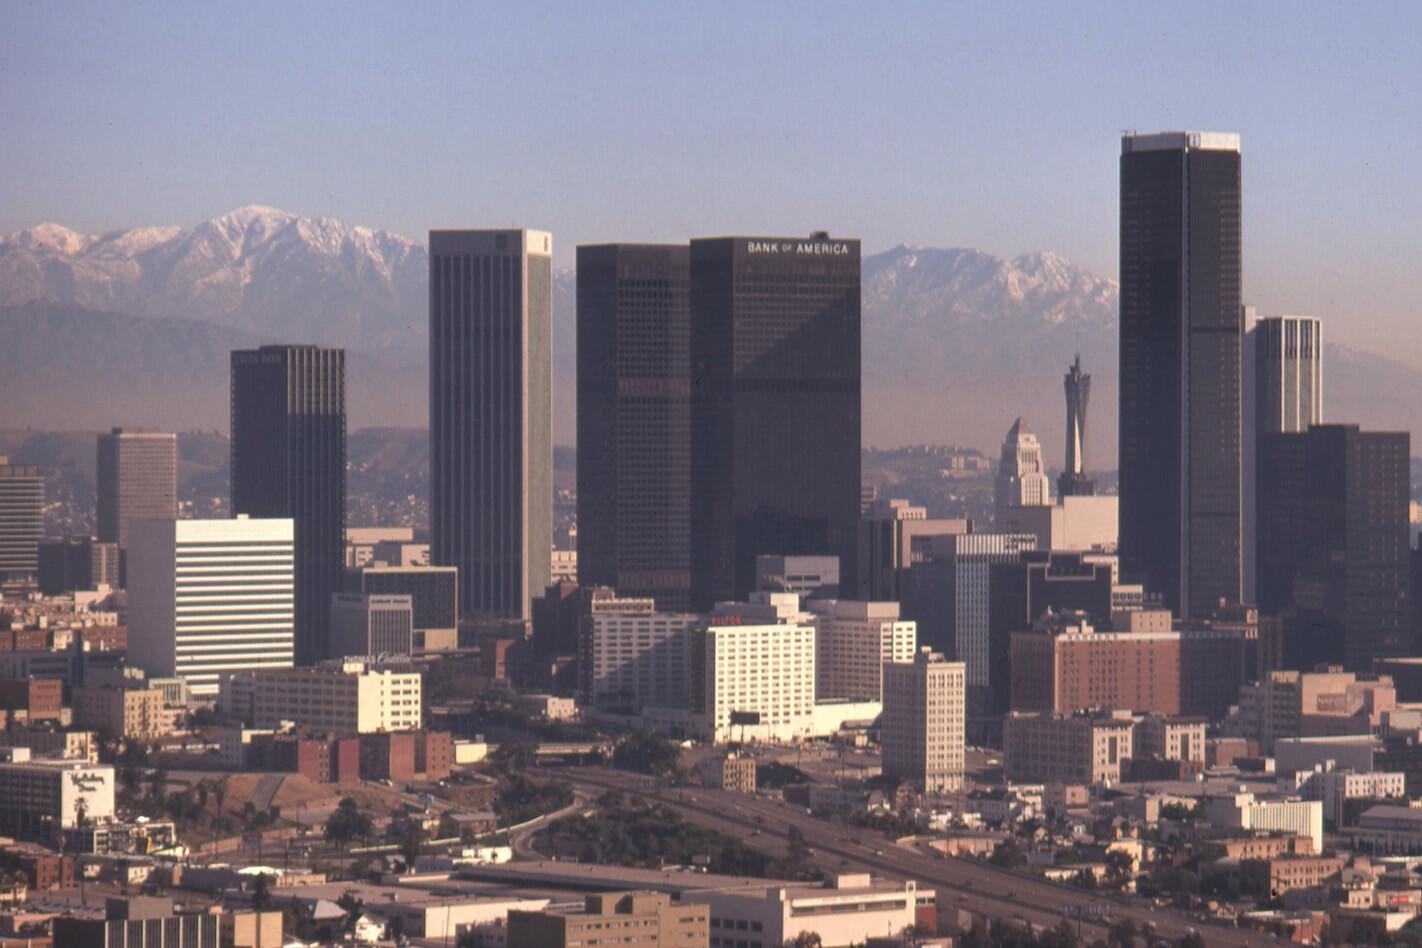 Los Angeles Smog 1970 S Downtown Jpg